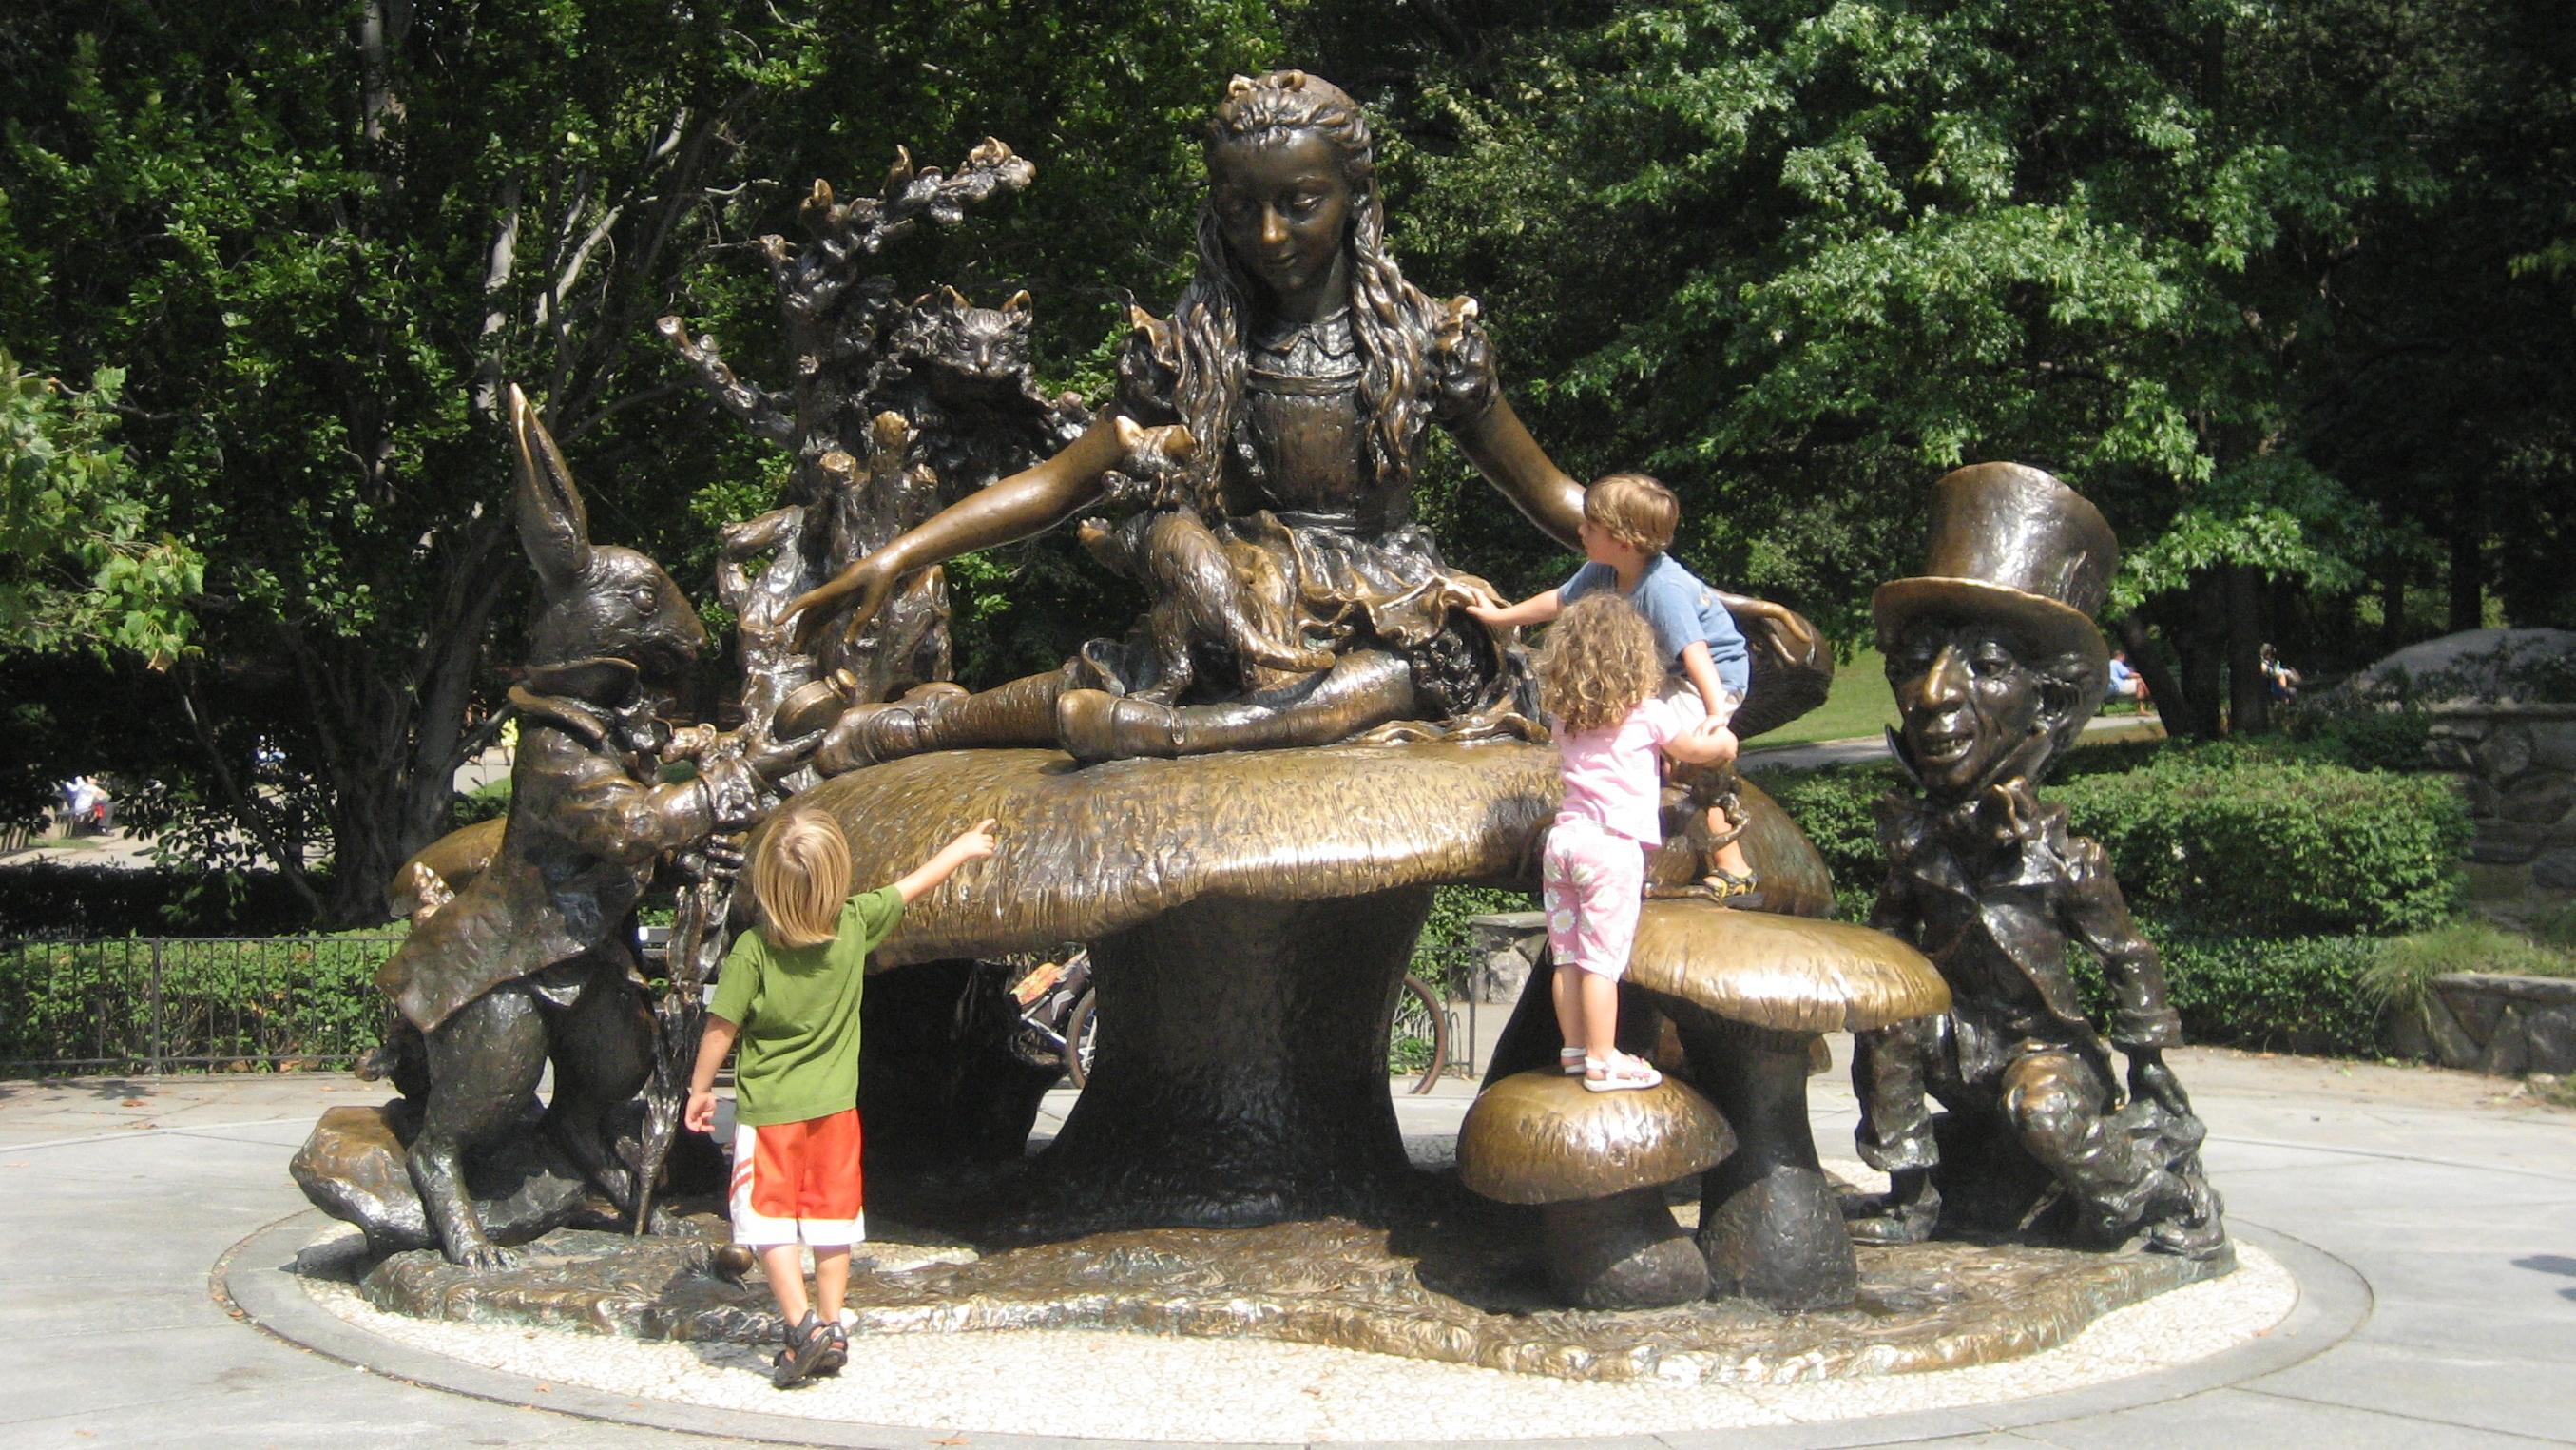 Explore free public art